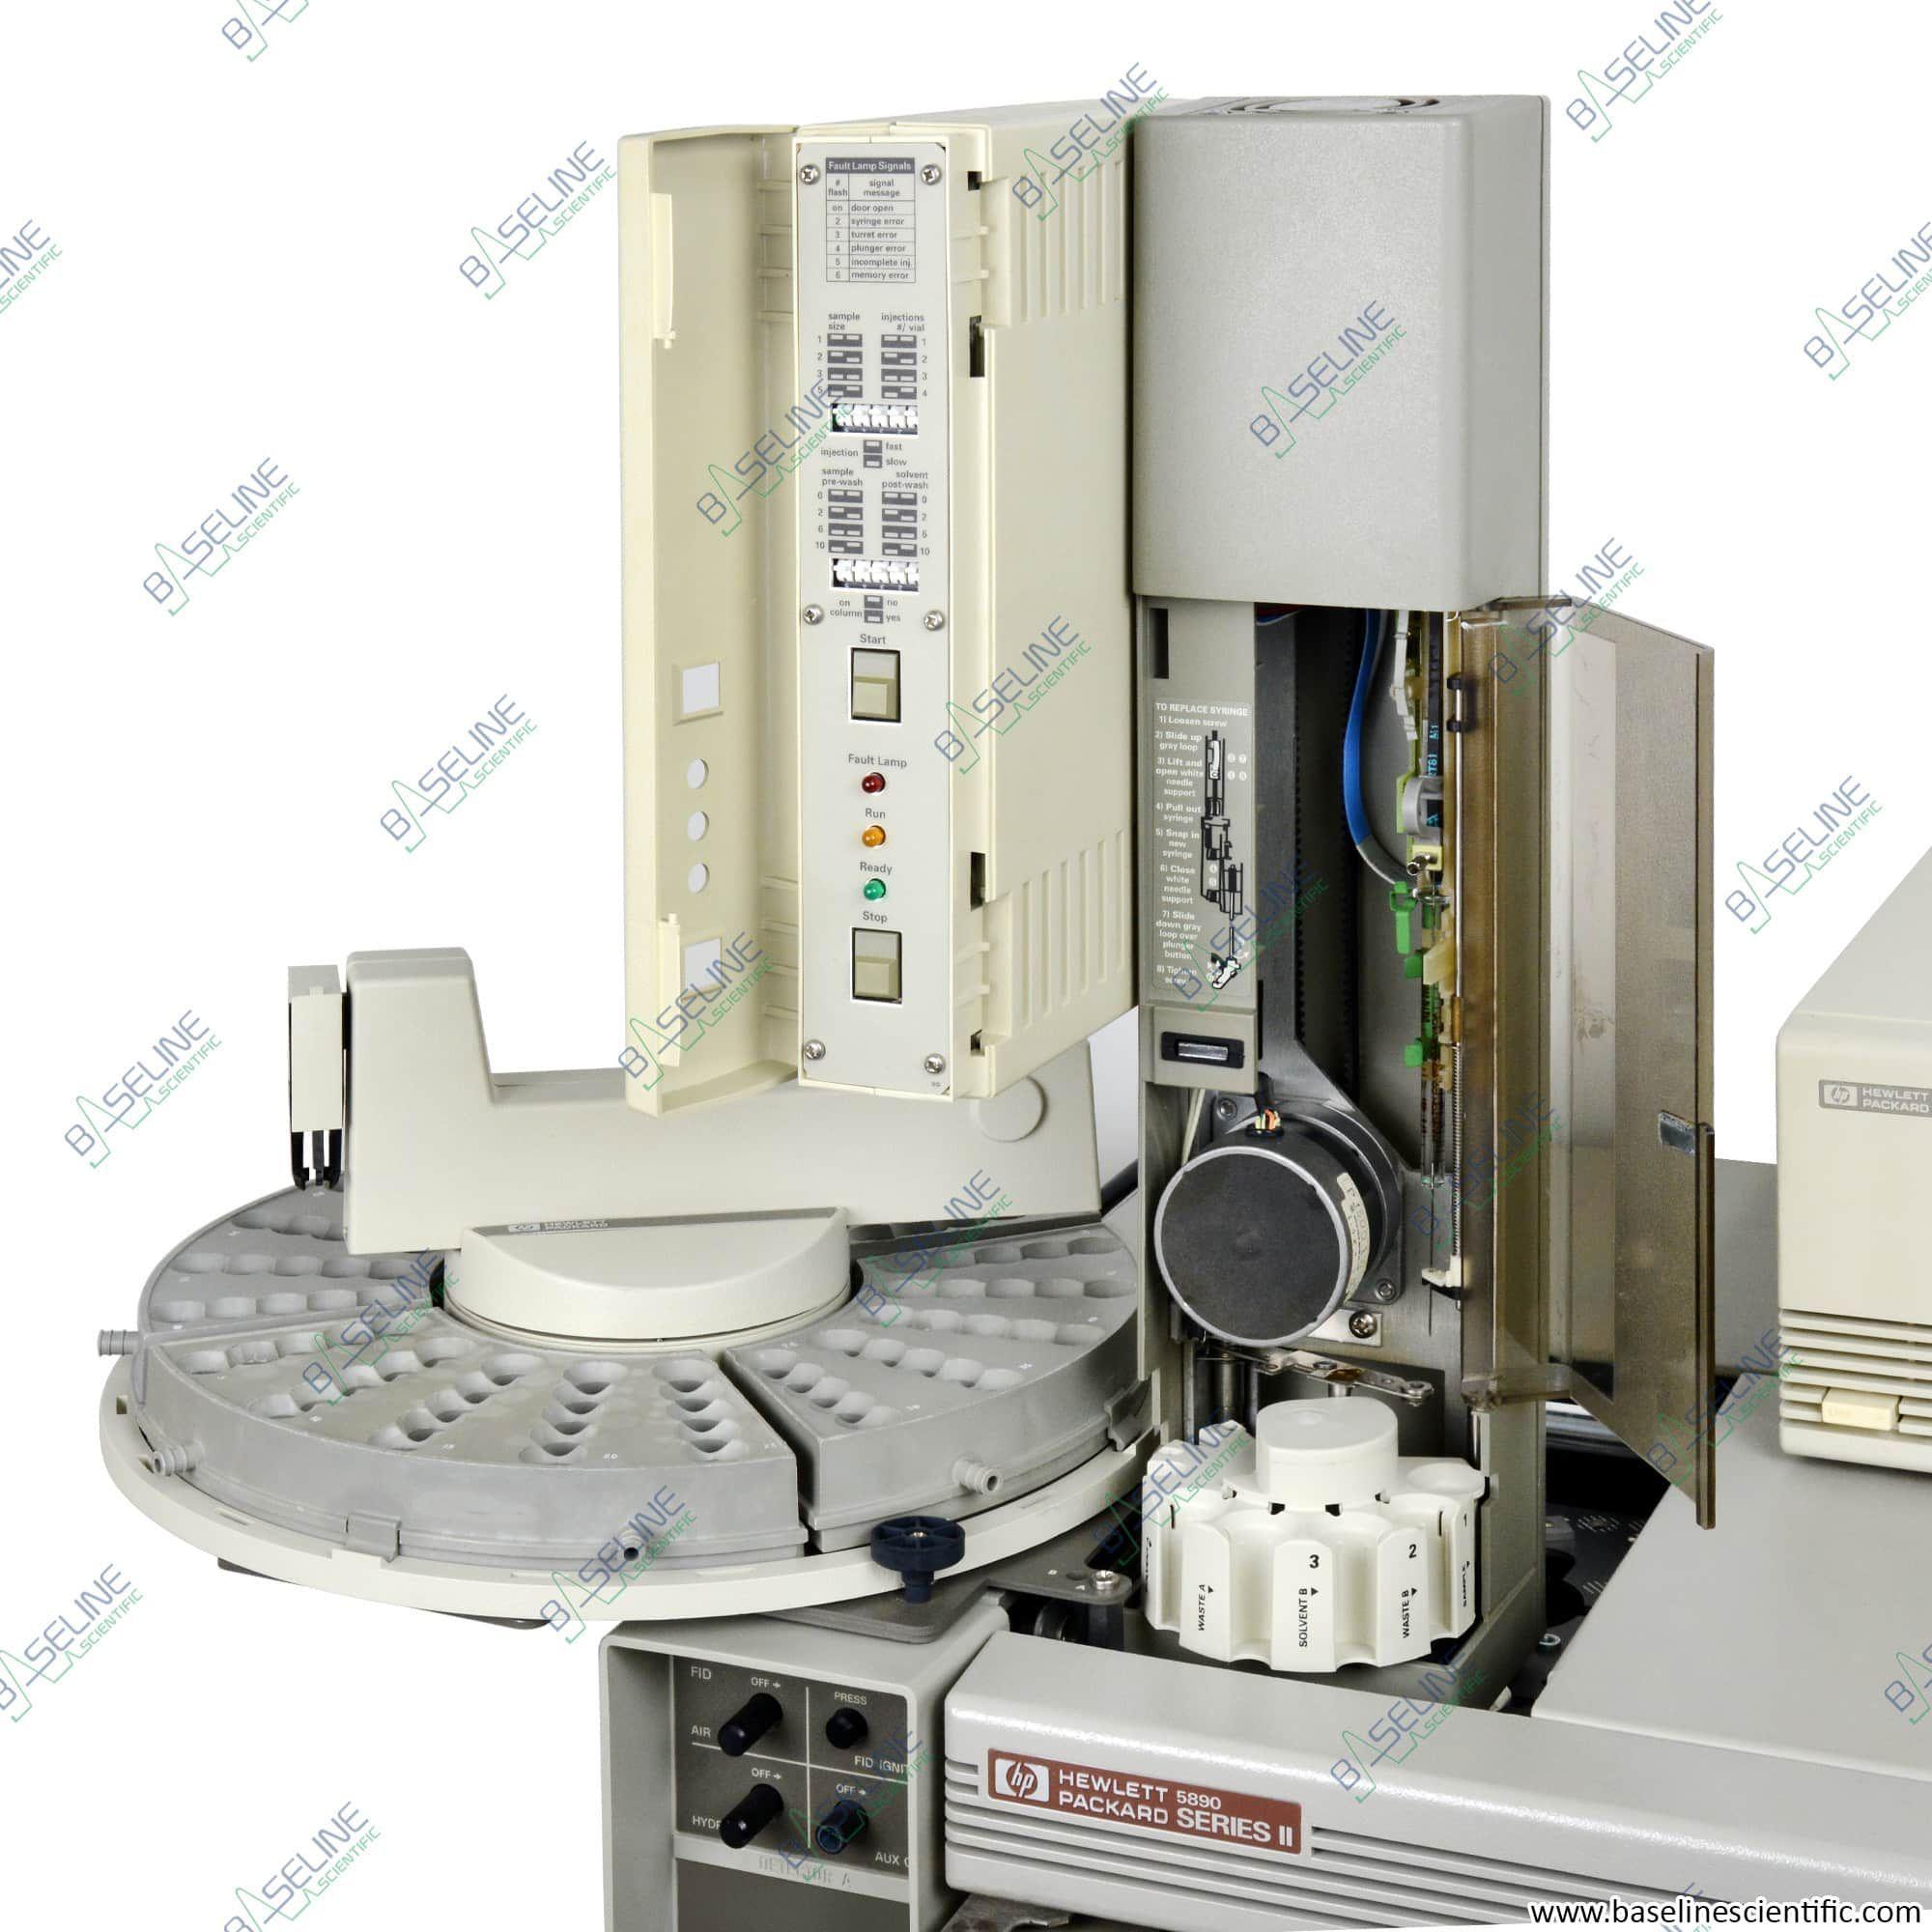 Refurbished HP 5890 Series II with Single SSL and single FID ONE YEAR WARRANTY